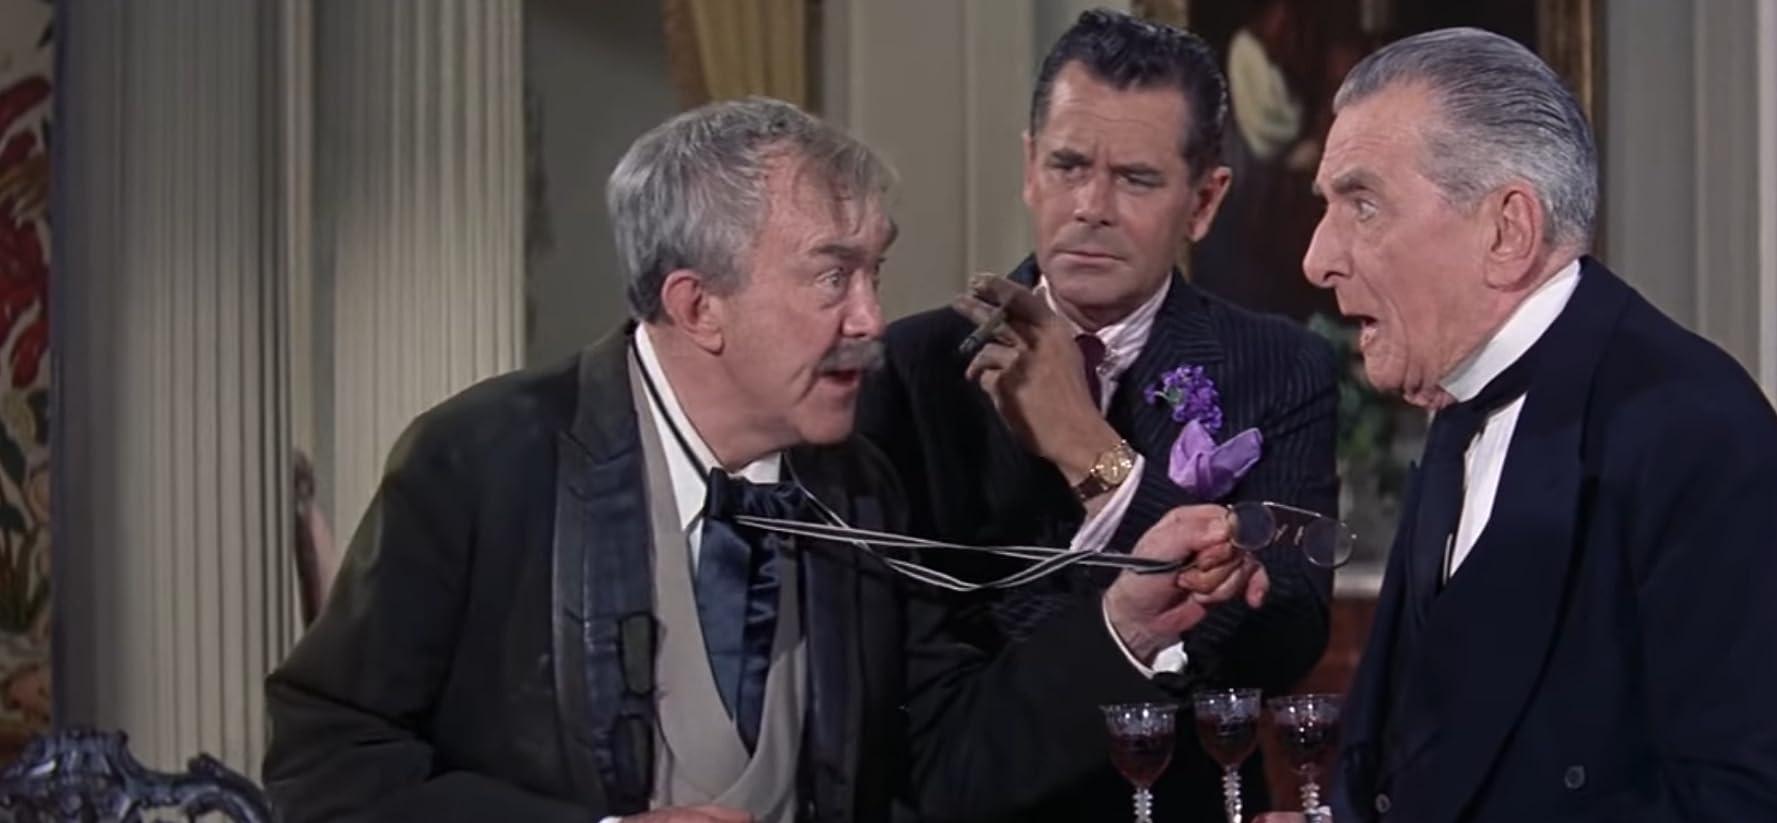 Glenn Ford, Edward Everett Horton, and Thomas Mitchell in Pocketful of Miracles (1961)